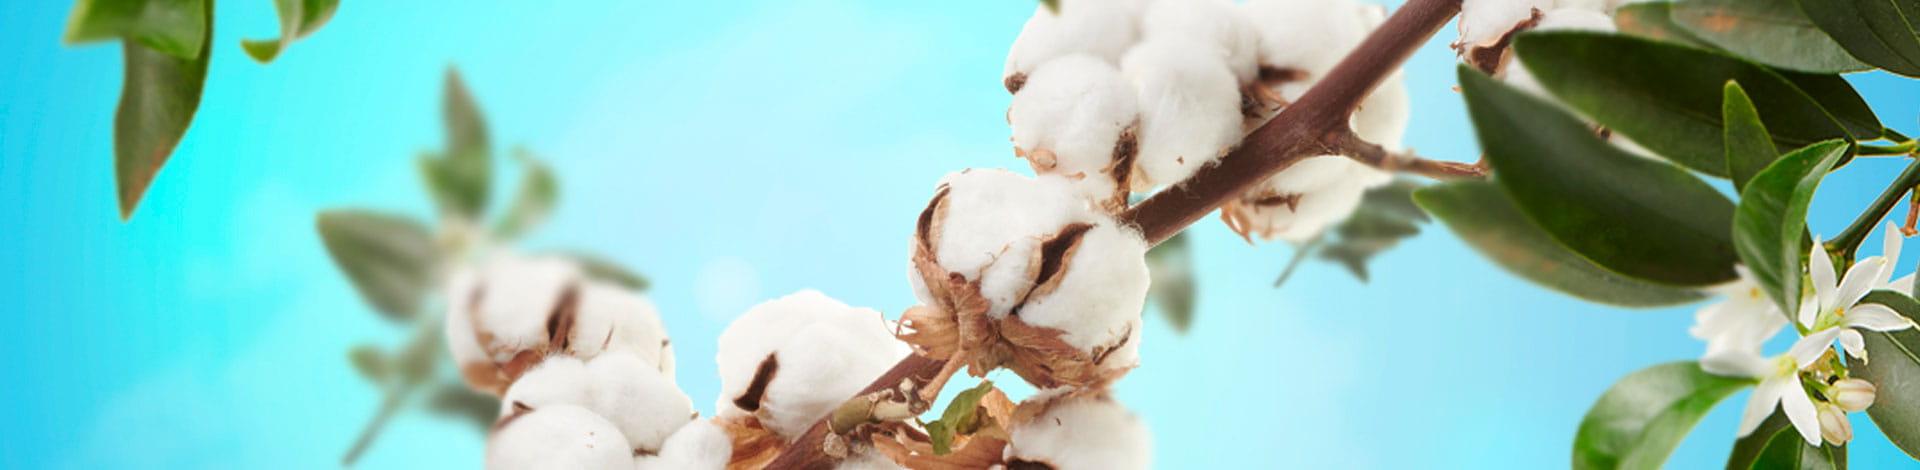 Planta de algodón - aroma fresco